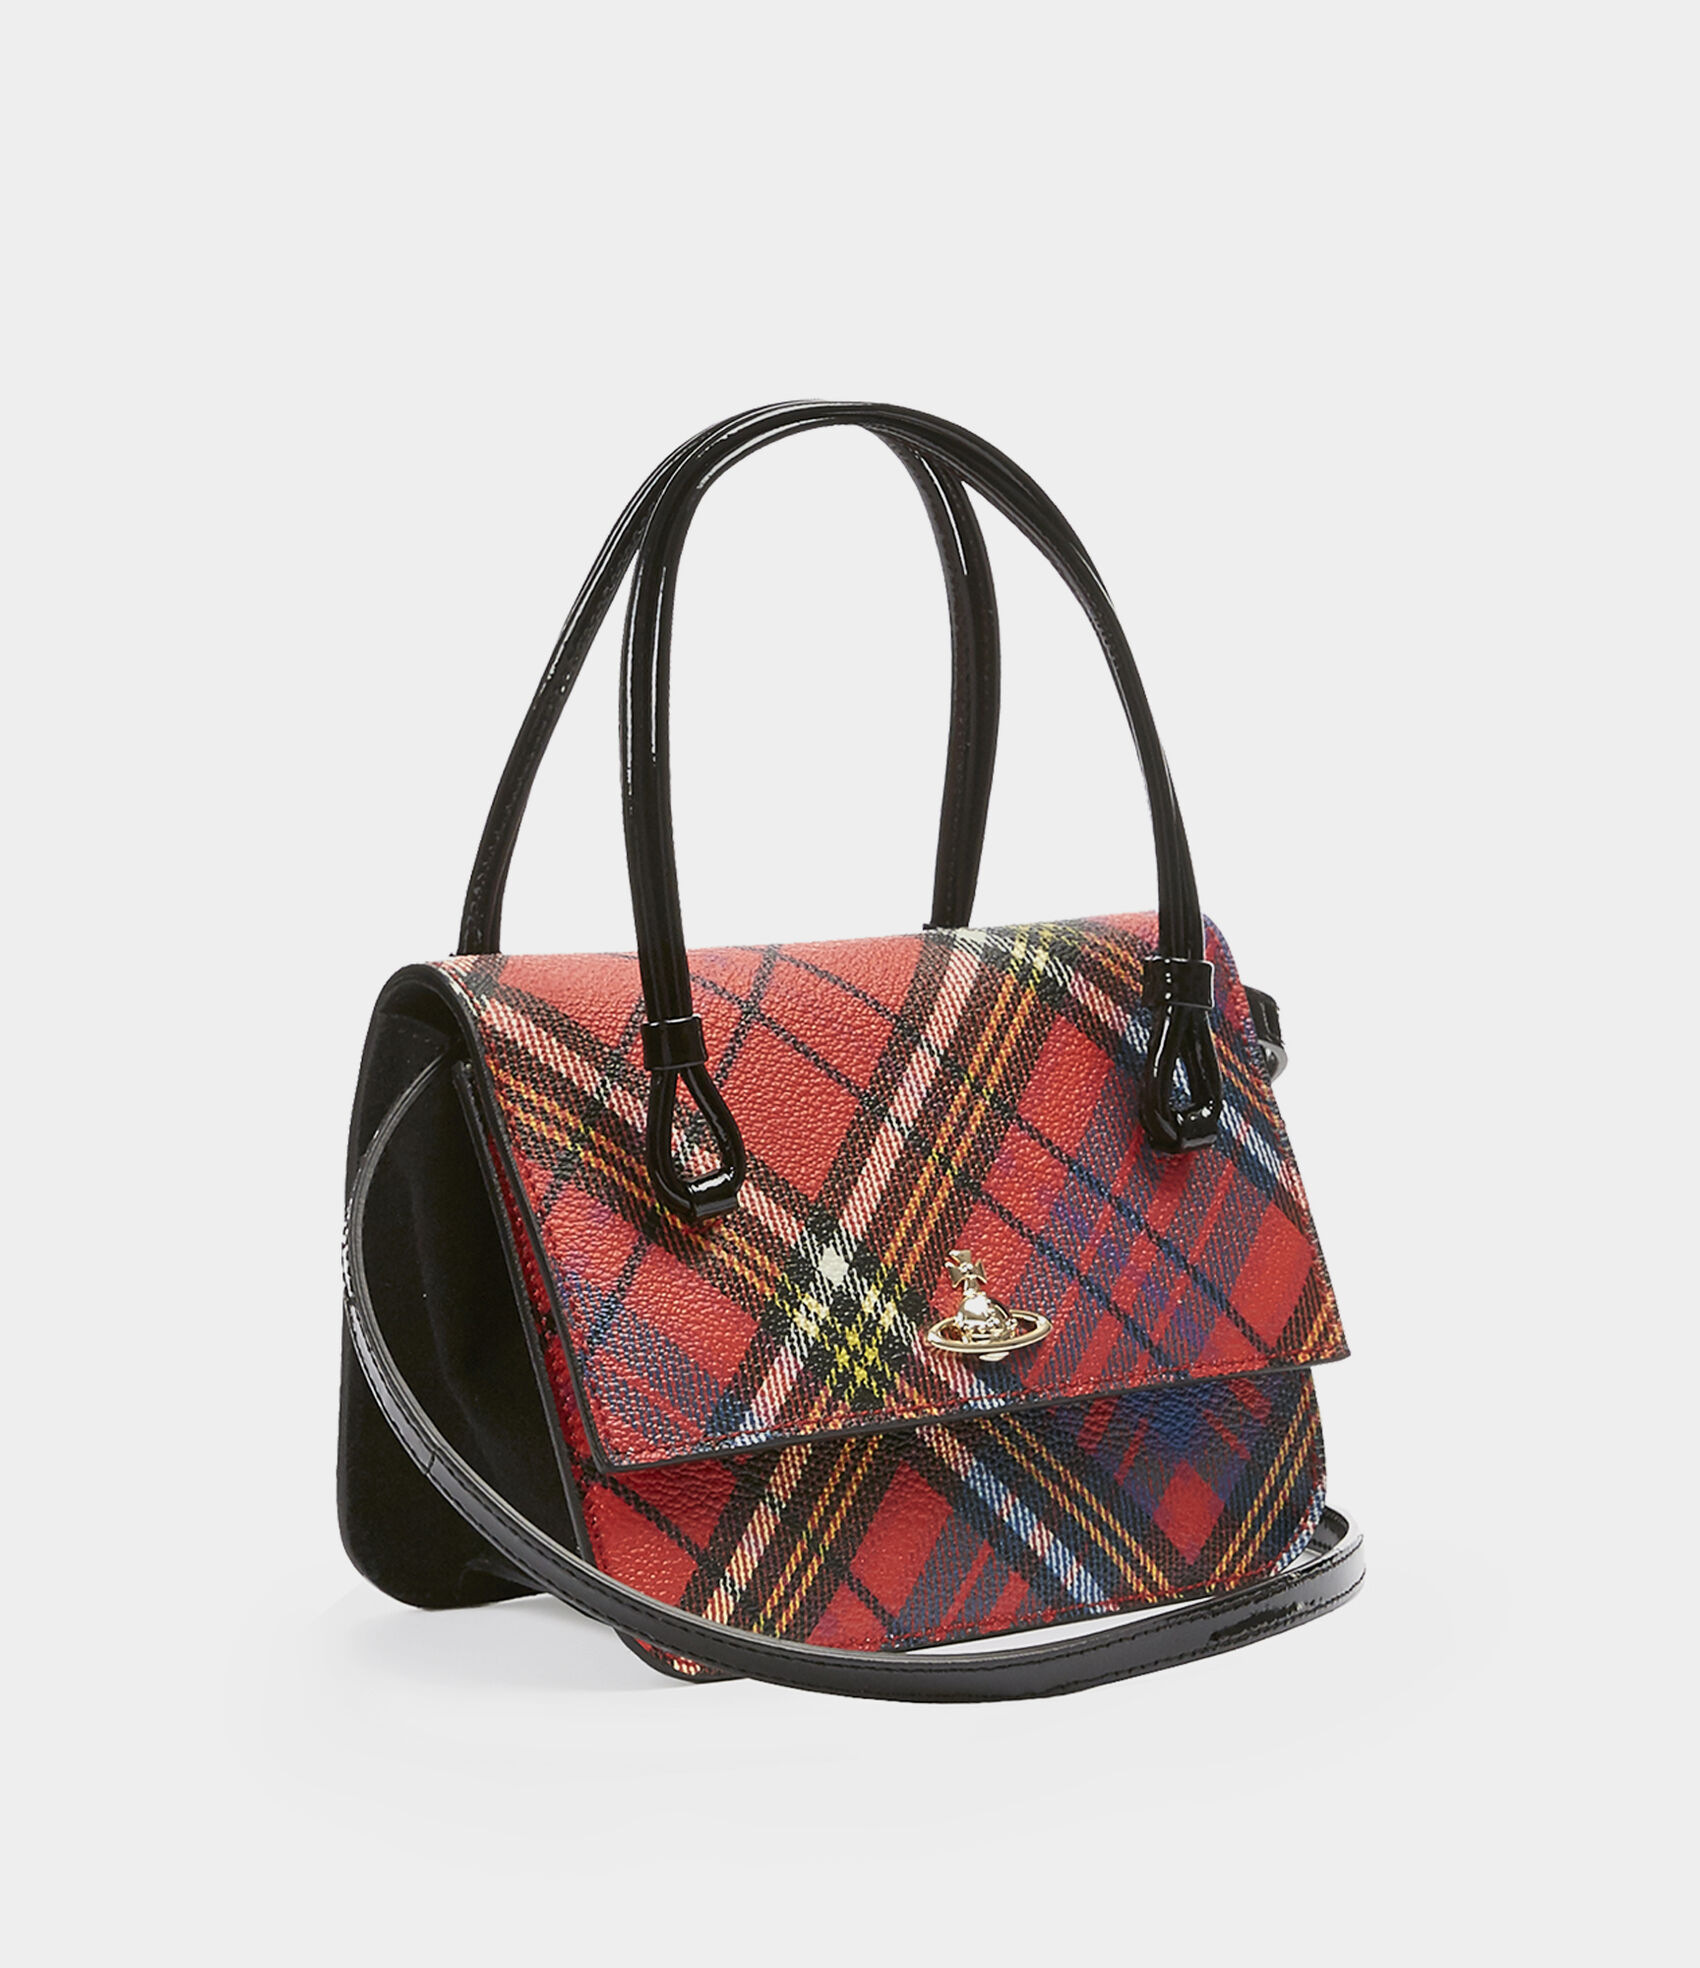 d374c2f1ec Vivienne Westwood Handbags | Women's Bags | Vivienne Westwood - Edinburgh  Small Handbag Mc Andreas